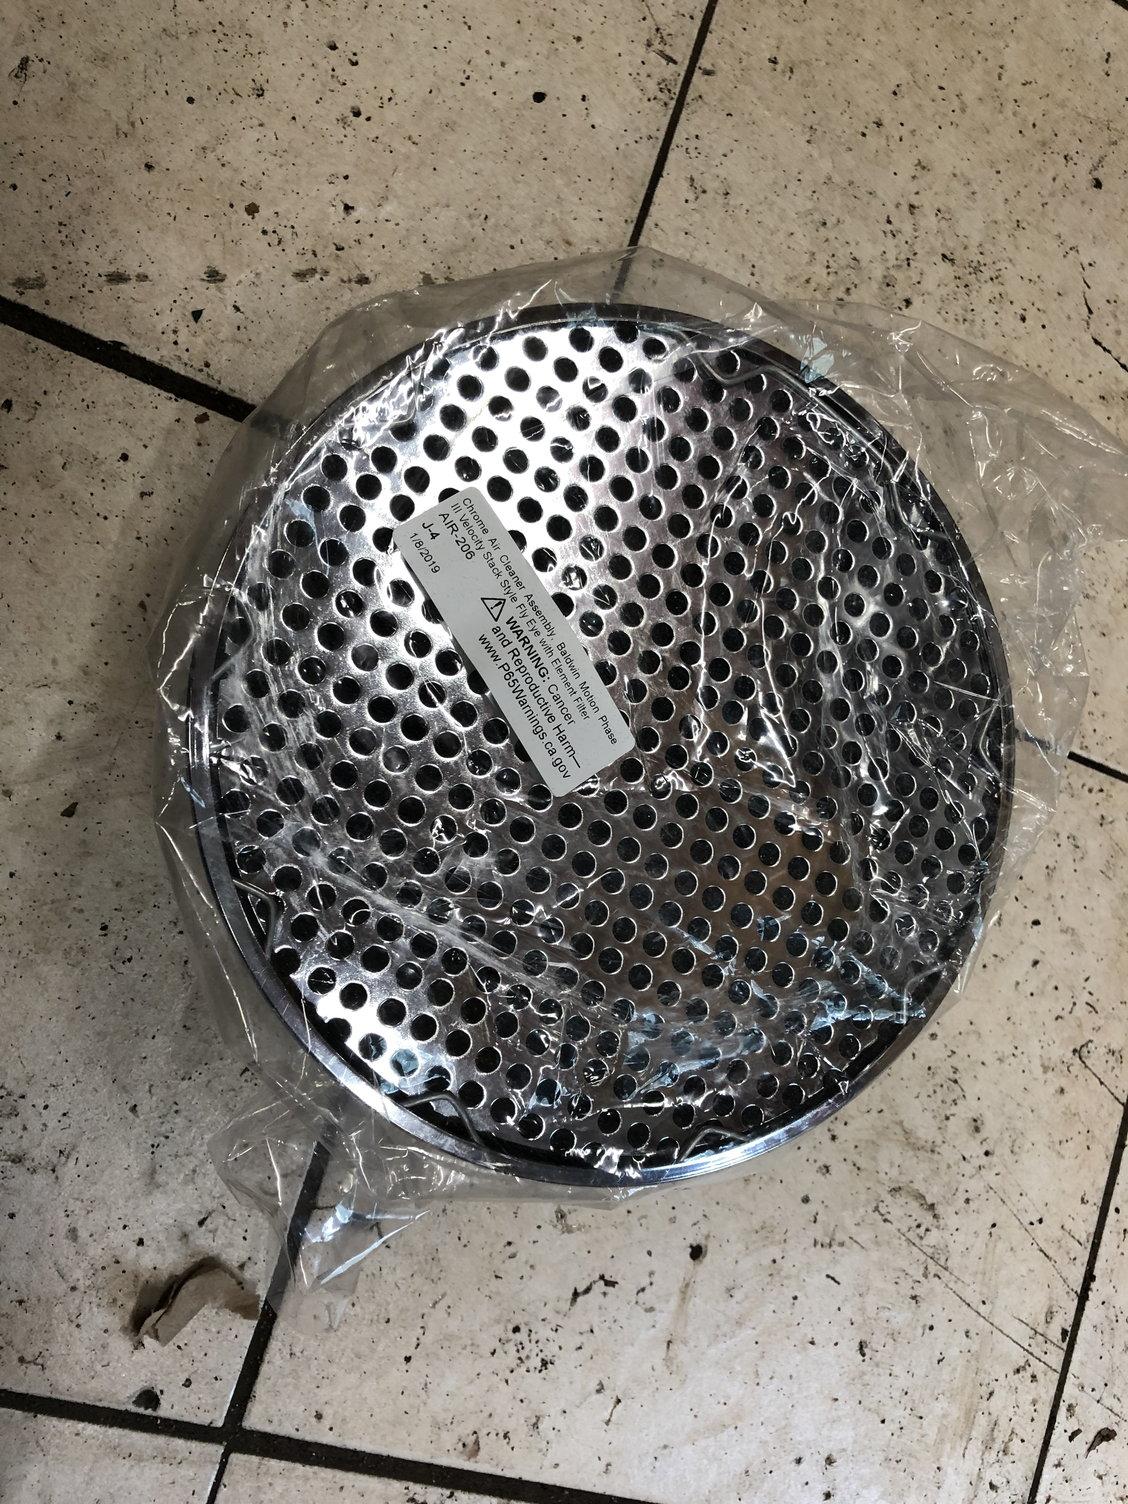 FS (For Sale) Velocity Stack air cleaner - CorvetteForum